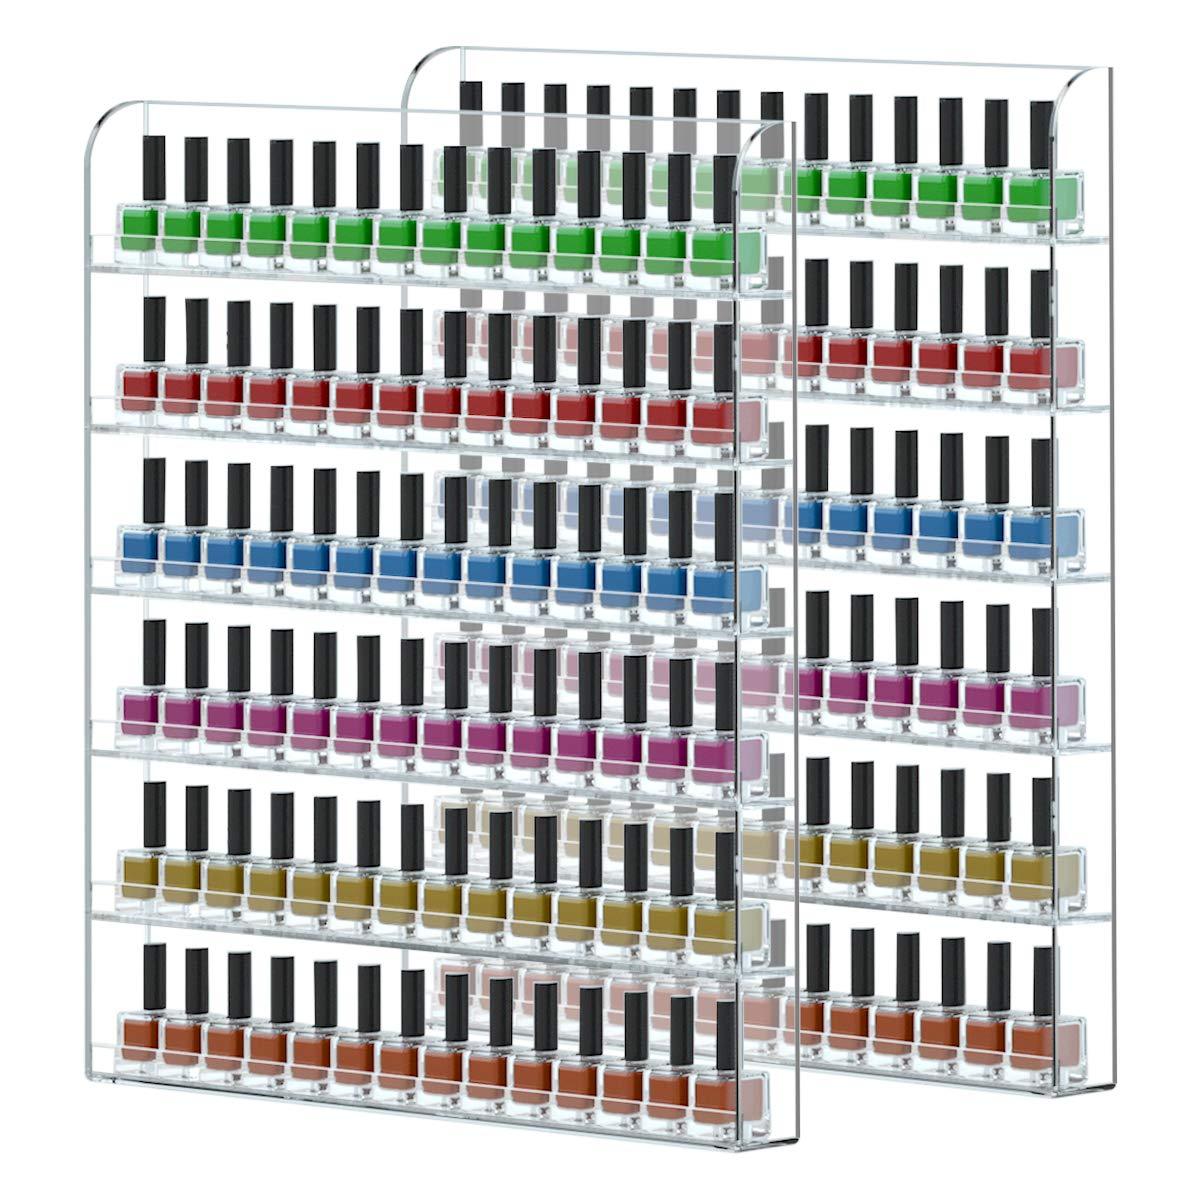 FEMELI 2 pack Nail Polish Wall Rack Hold Up To 200 Bottles,Clear Acrylic Nail Polish Display Holder Organizer 6 Rows